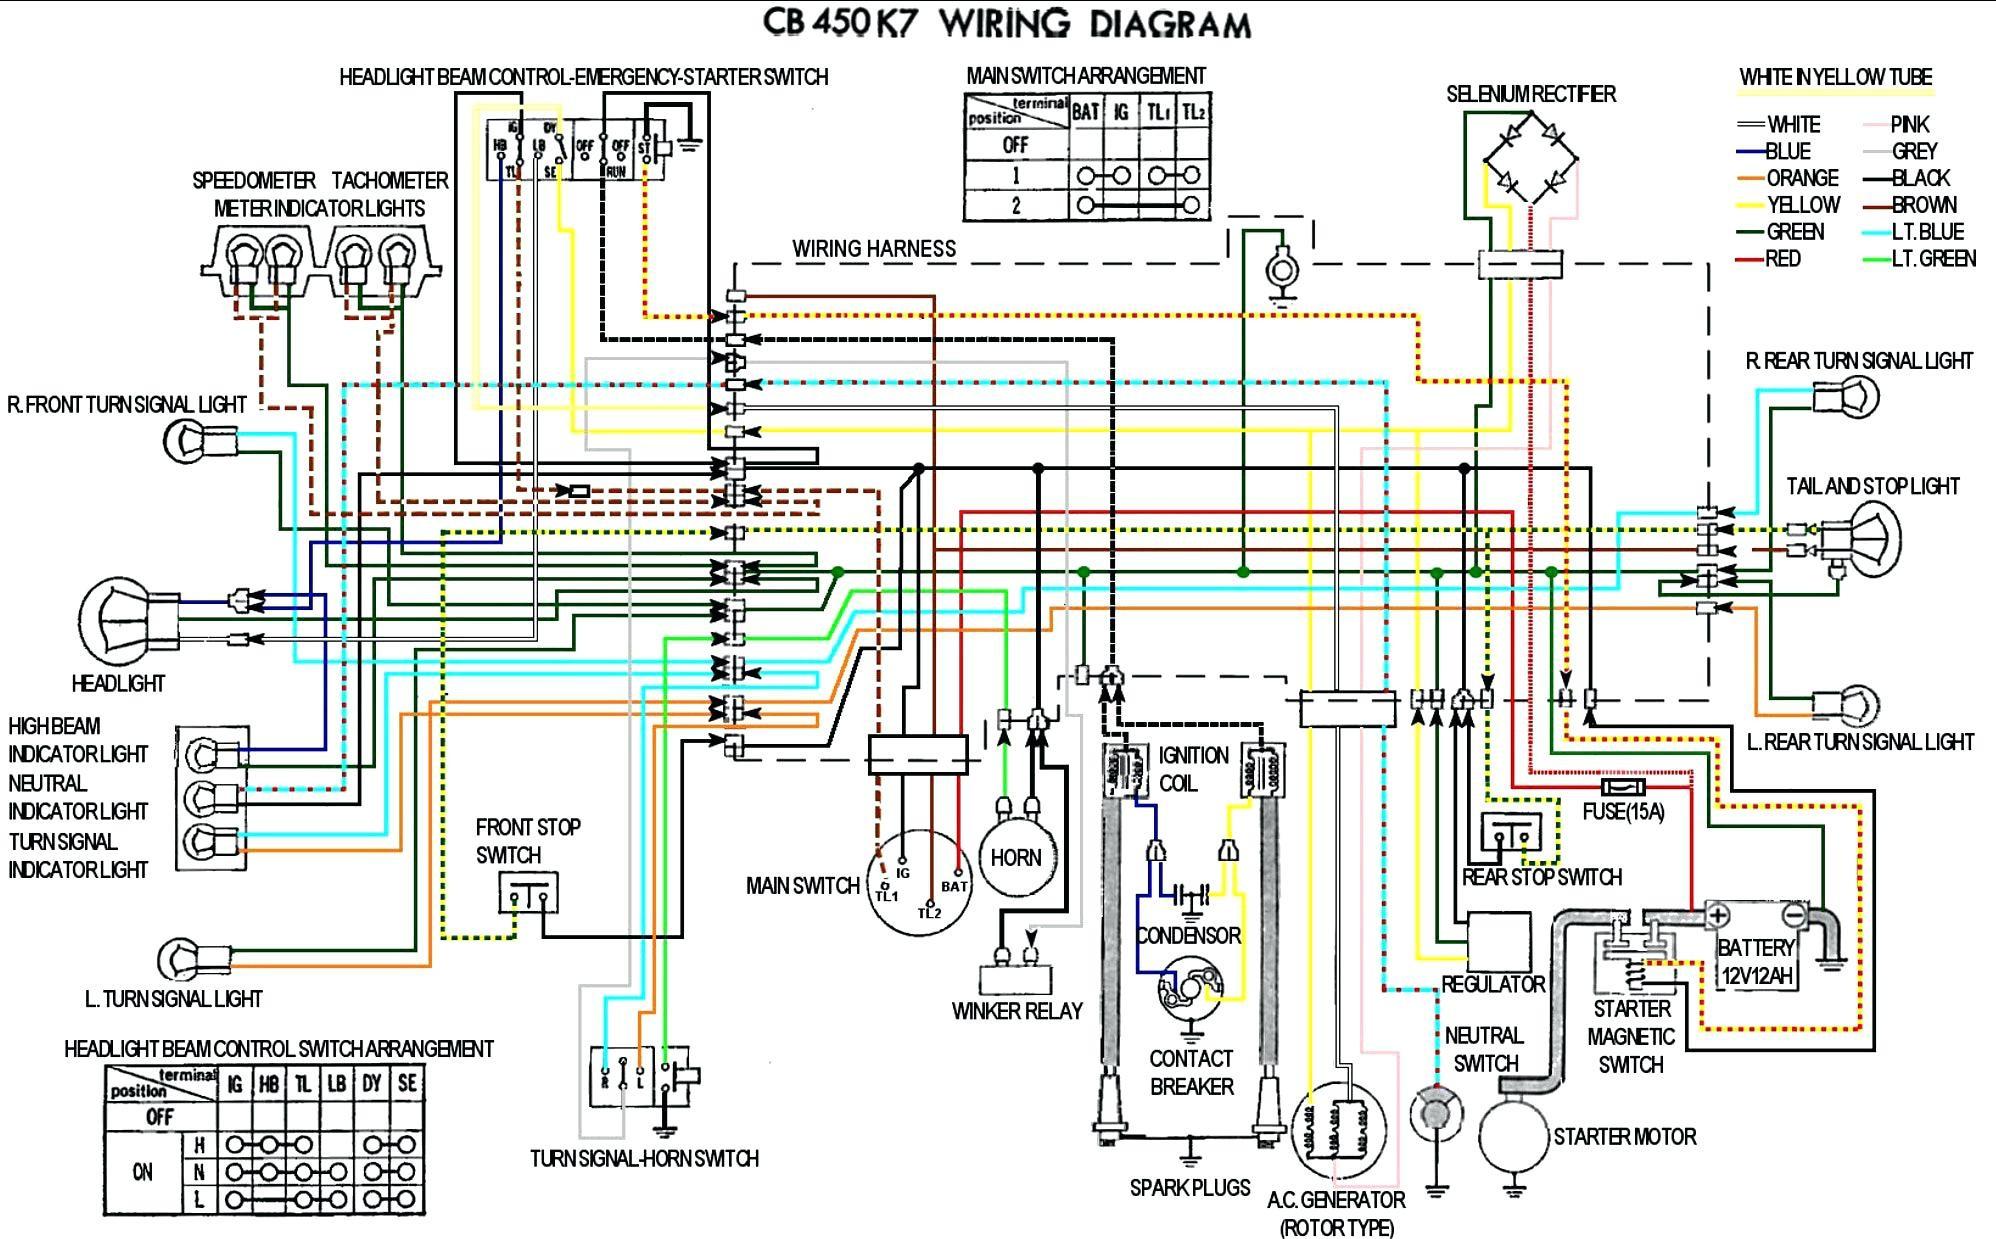 John Deere 145 Wiring Diagram   Wiring Diagram on jd x340 wiring diagram, jd z225 wiring diagram, jd x500 wiring diagram, jd f525 wiring diagram, jd lt155 wiring diagram, jd stx38 wiring diagram, jd l100 wiring diagram, jd gx345 wiring diagram,